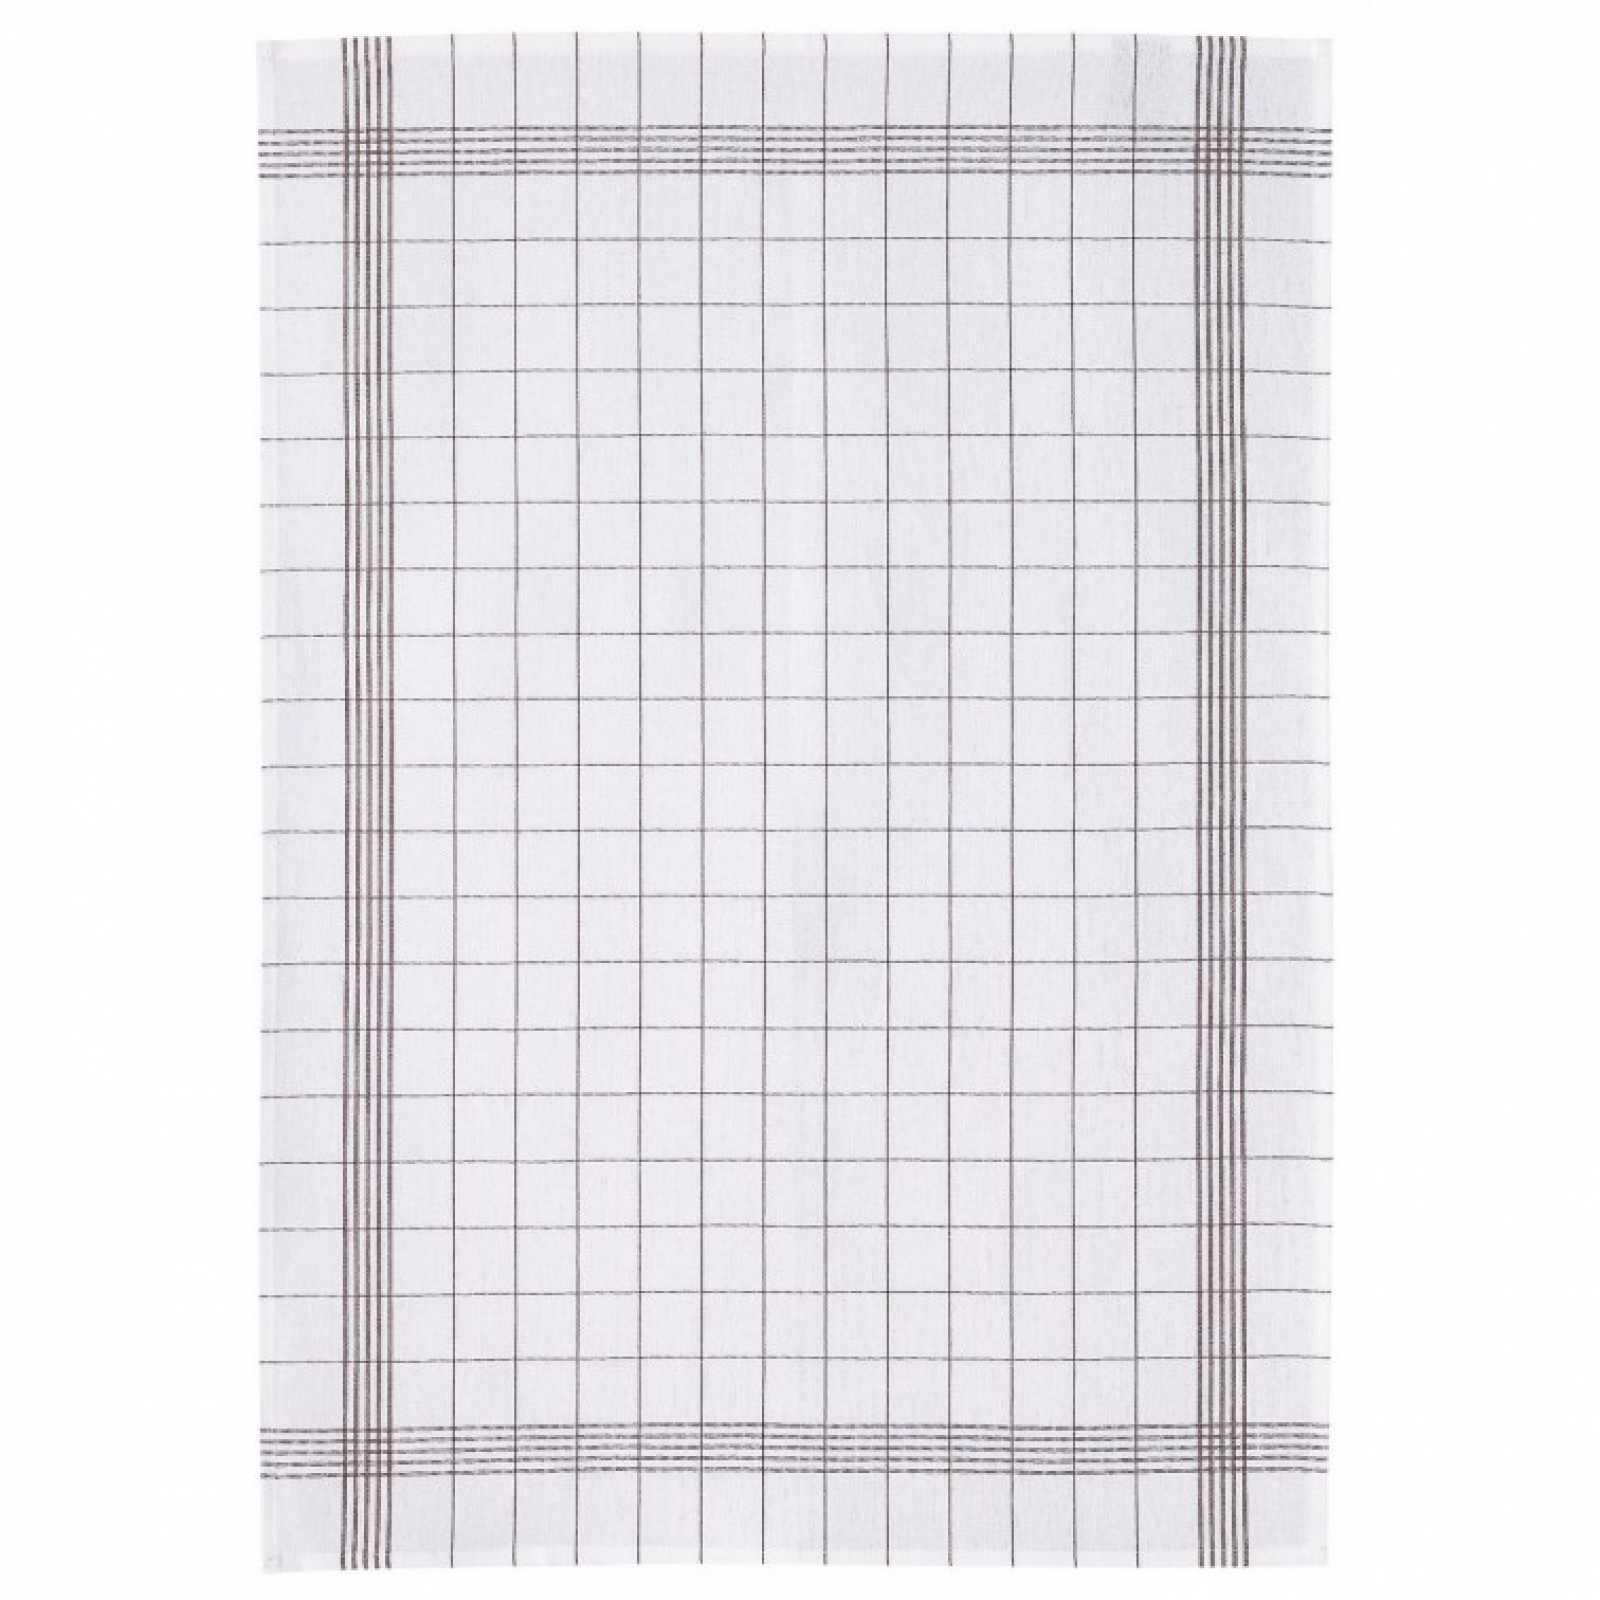 Онлайн каталог PROMENU: Полотенце кухонное Winkler TECHNIQUE, 55х75 см, белый в темно-серую клетку Winkler 7327087000